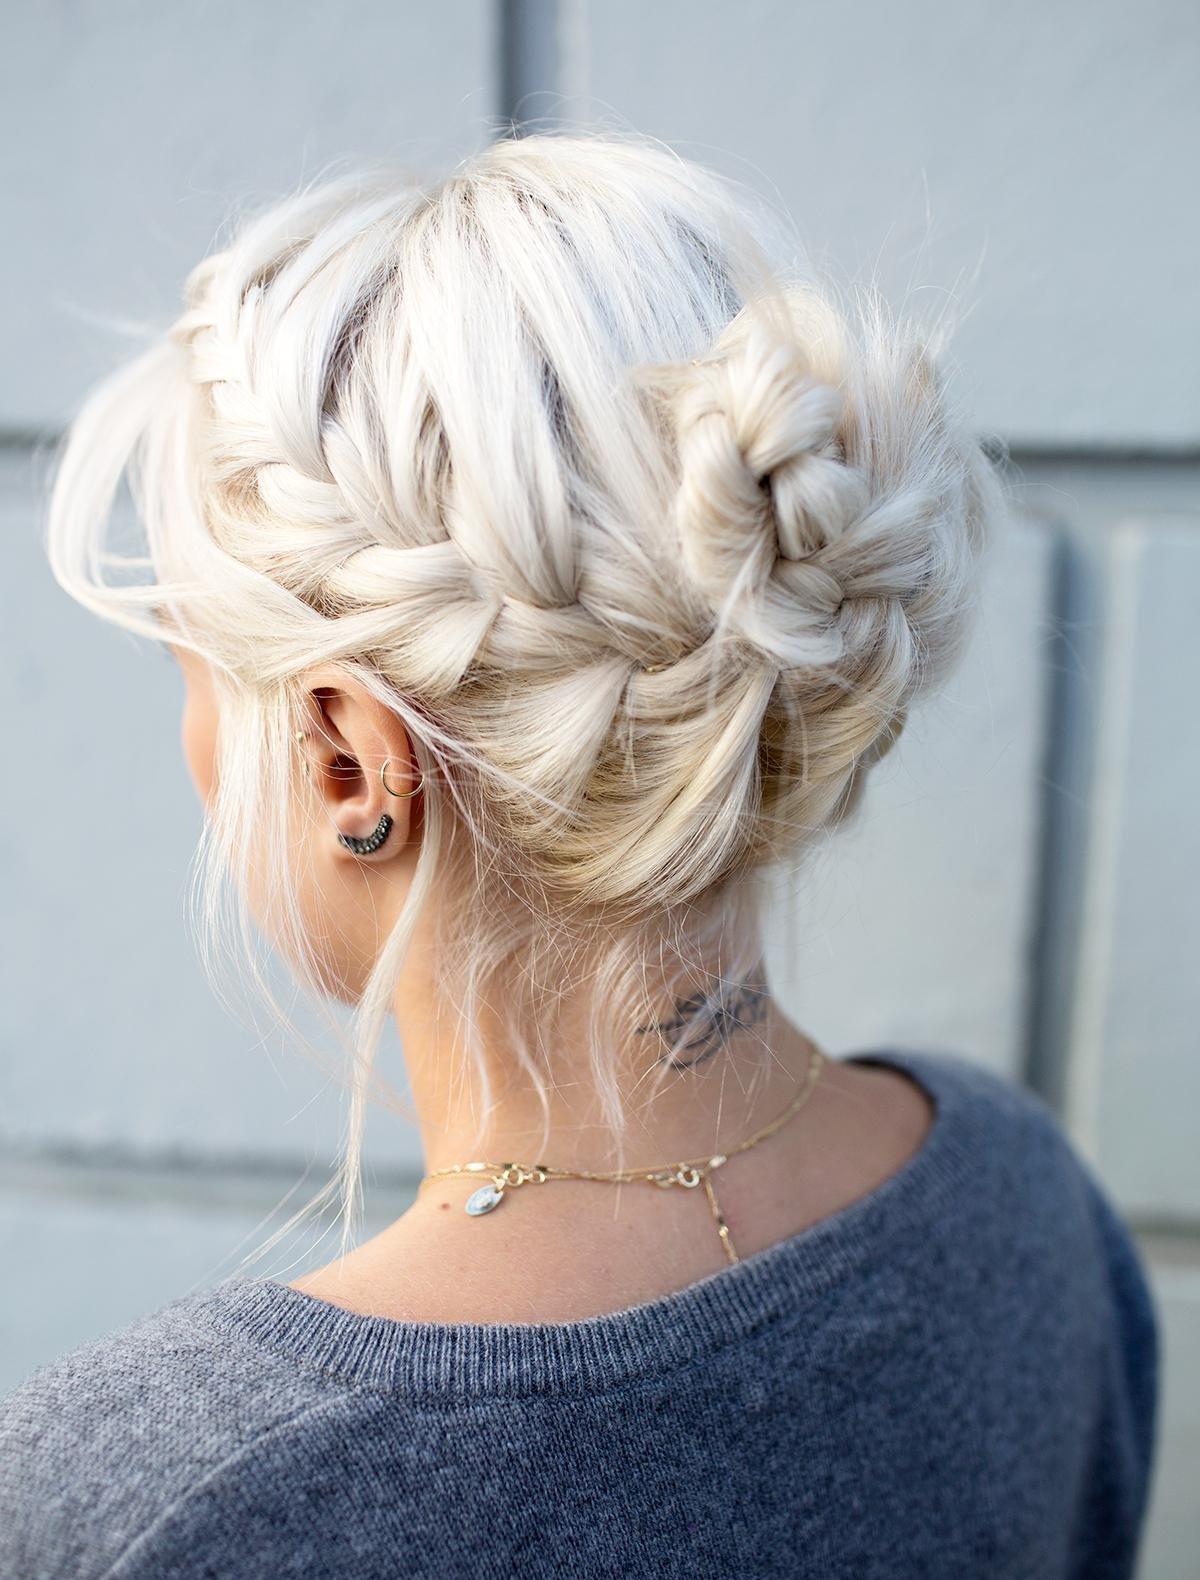 hair inspo tumblr - 736×969